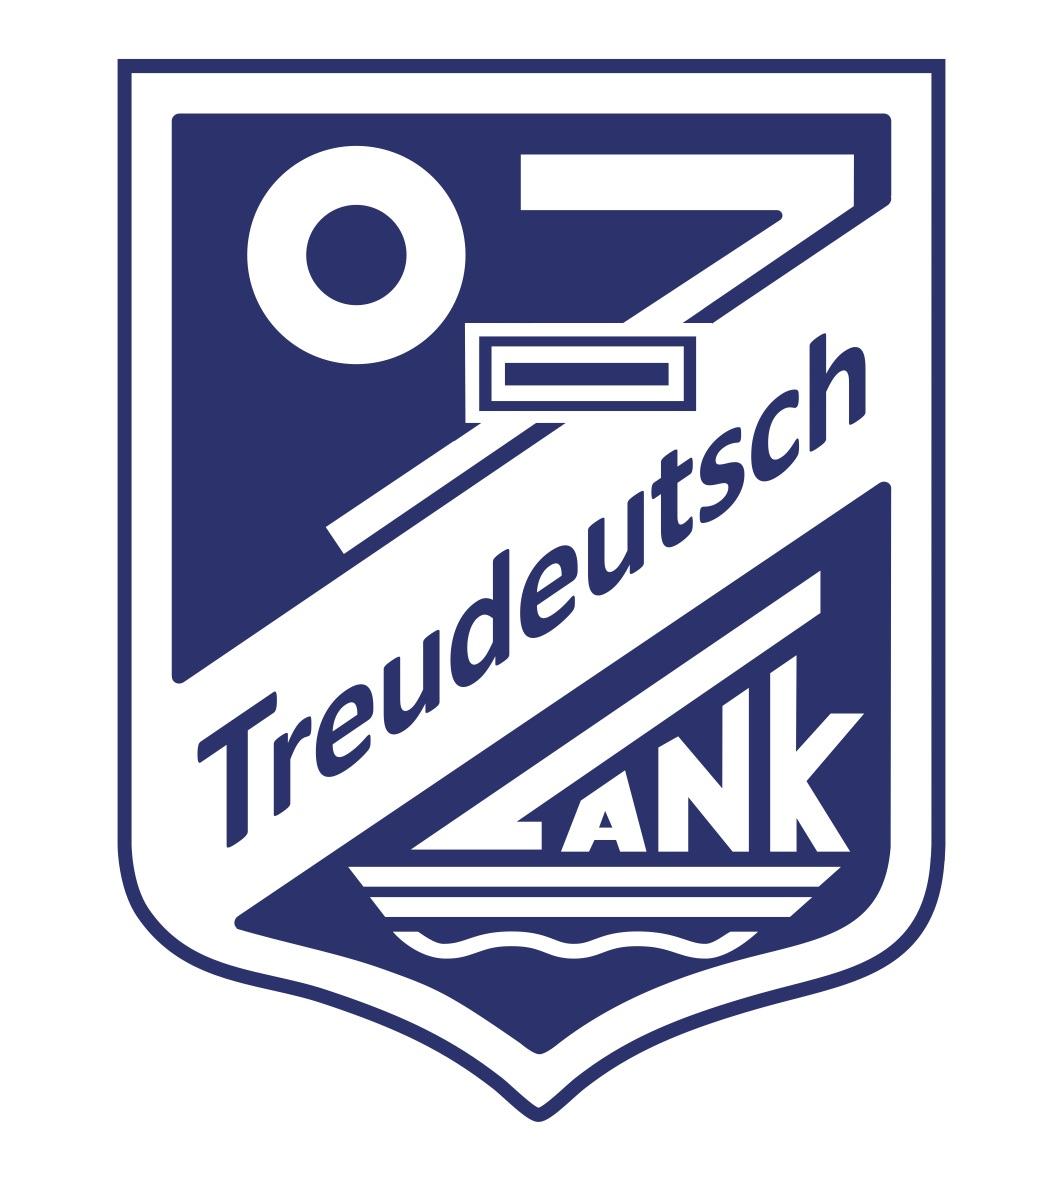 TuS Treudeutsch 07 Lank e.V. Logo